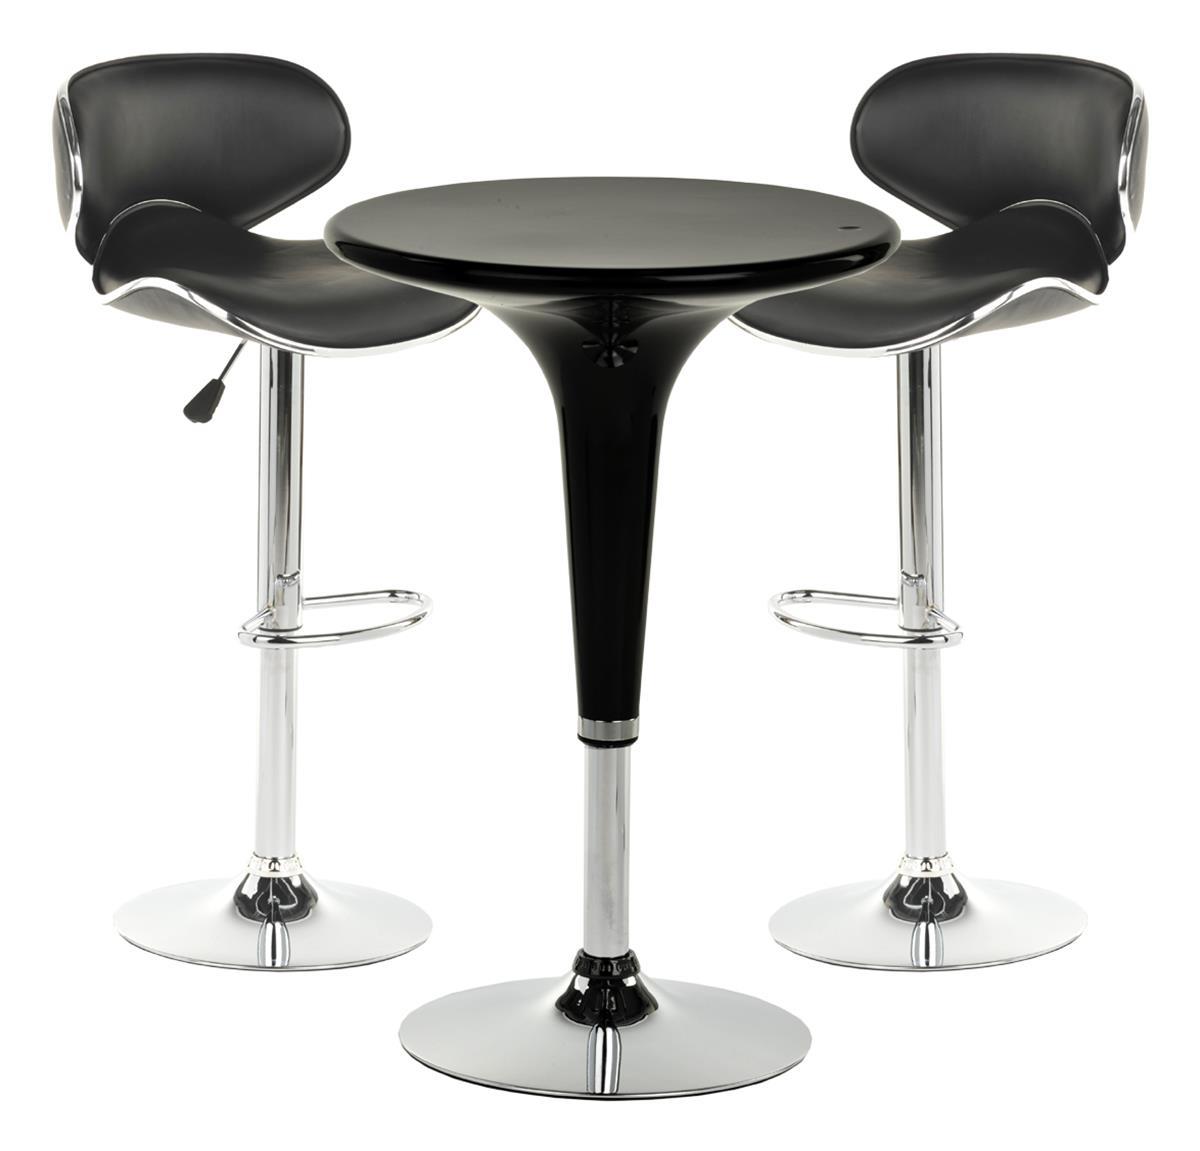 sc 1 st  Displays2go & Chrome Pub Table Set | Modern Furniture with A Retro Charm